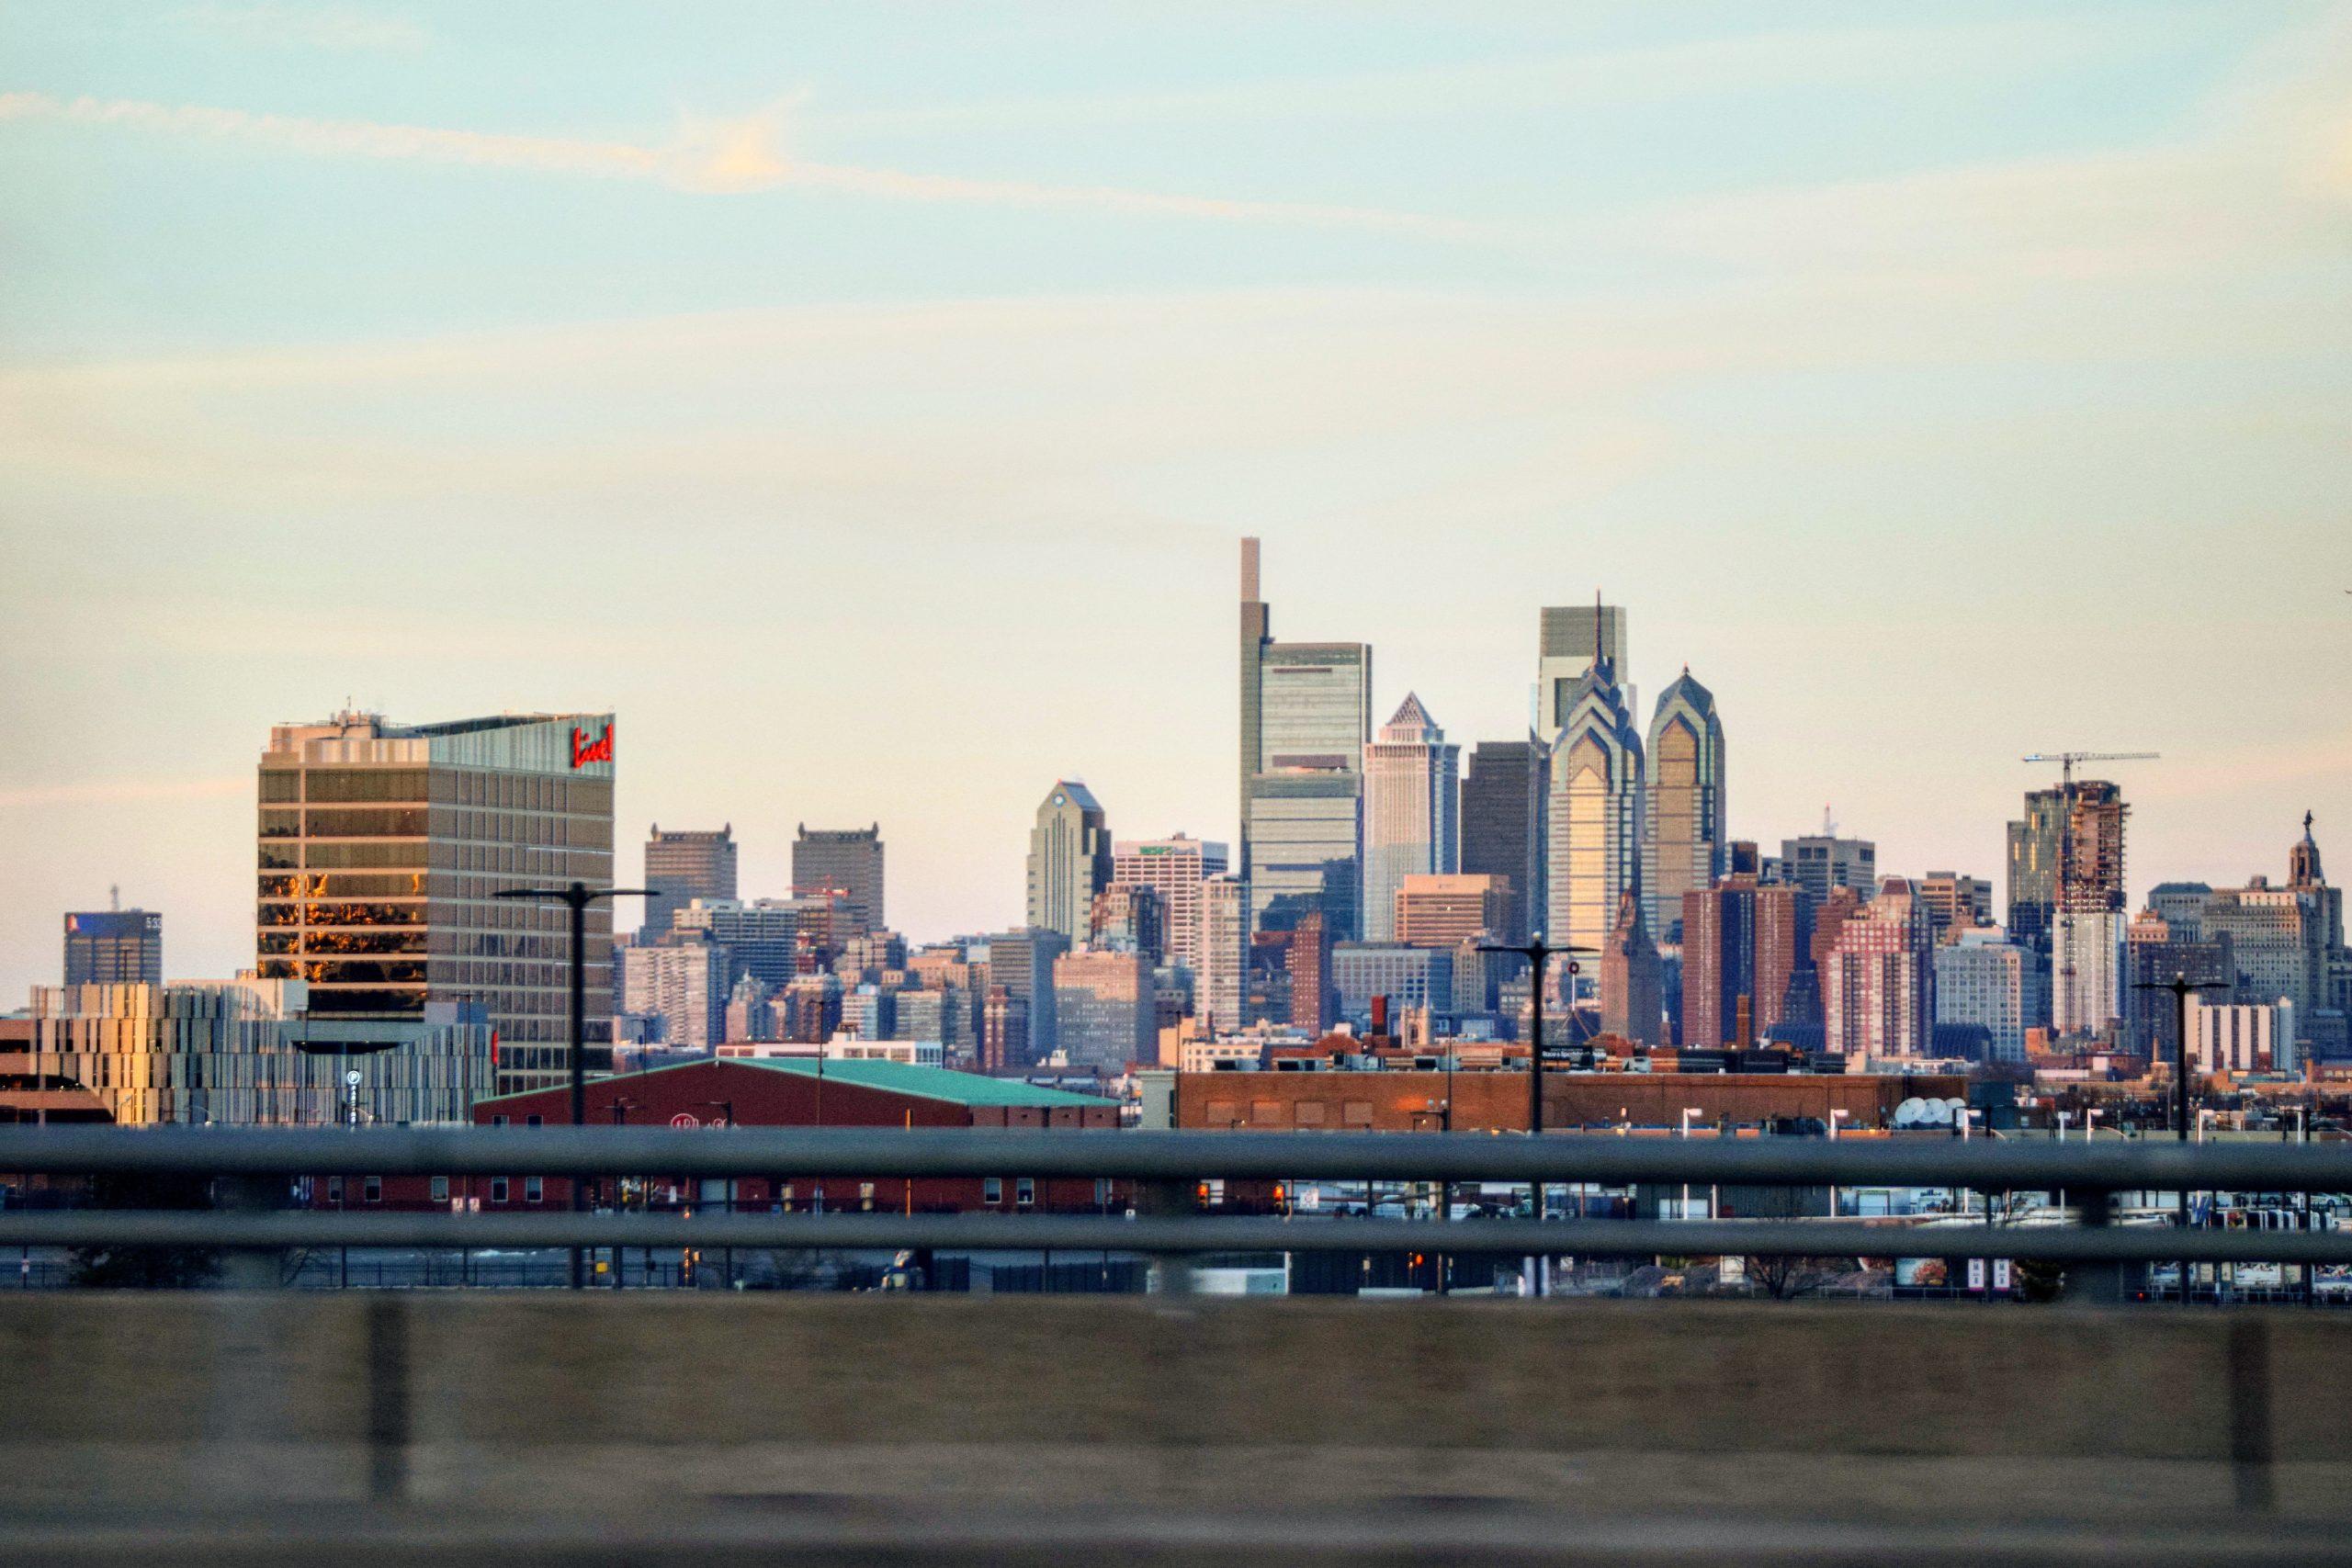 Live! Casino and Hotel with the Philadelphia skyline. Photo by Thomas Koloski